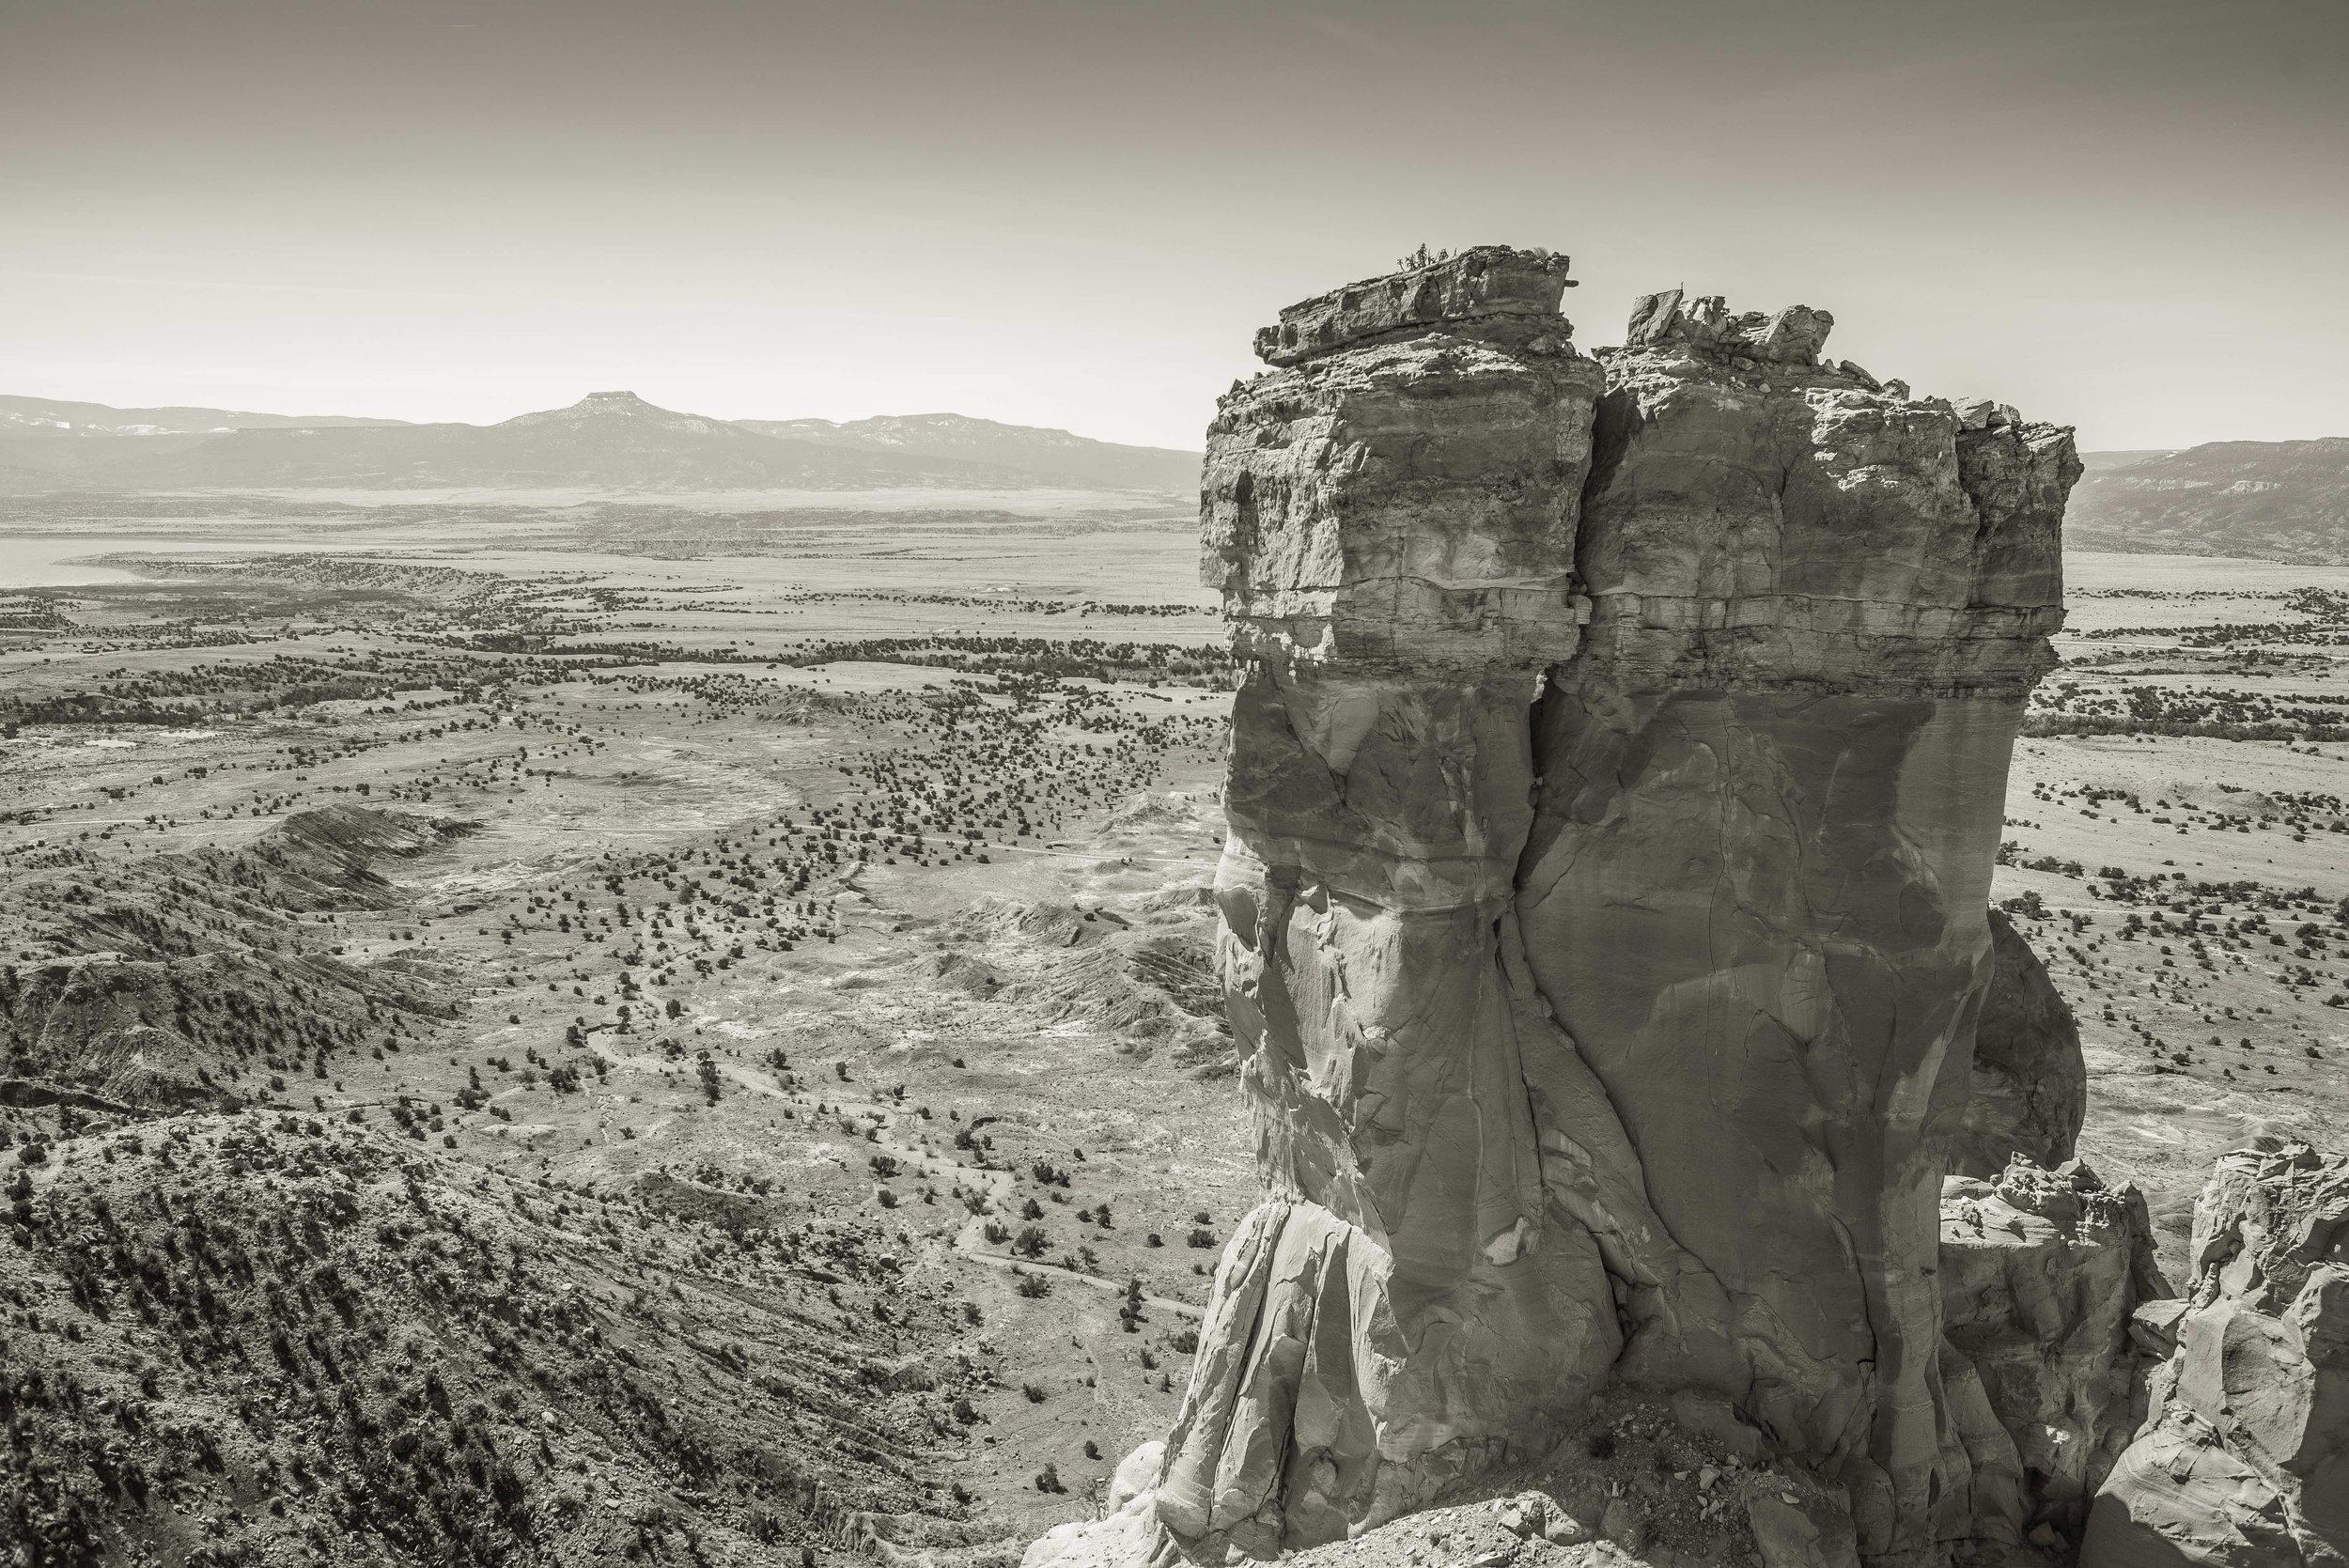 Chimney Rock I, Abiquiu, NM